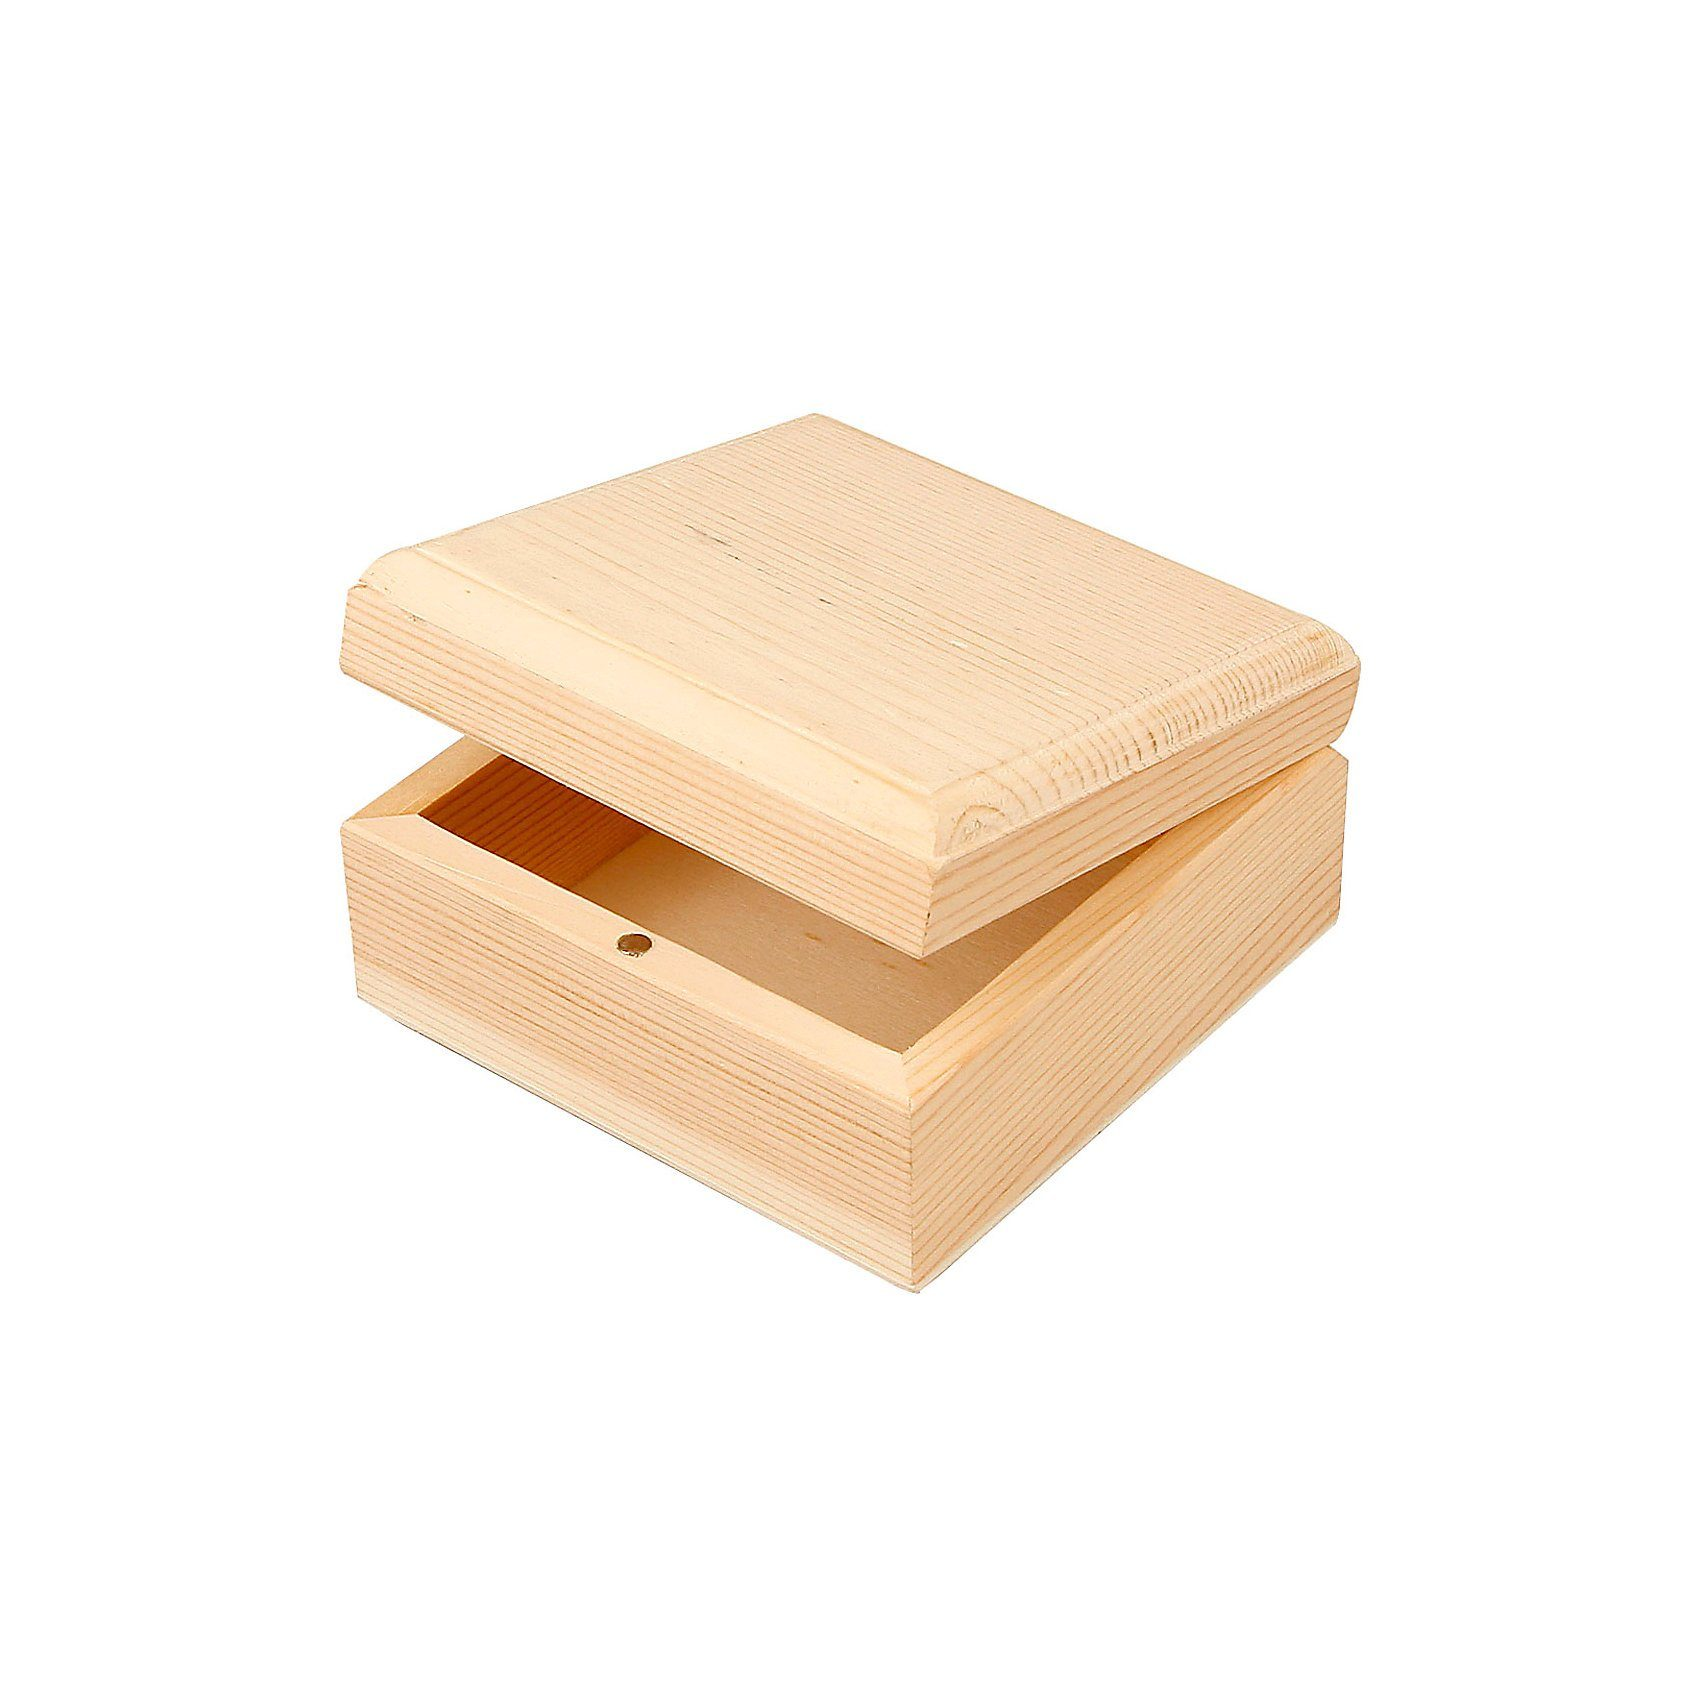 Holzschatulle, Größe 9x9x5 cm, Innenmaße 7,5x7,5x3 cm, Kaise